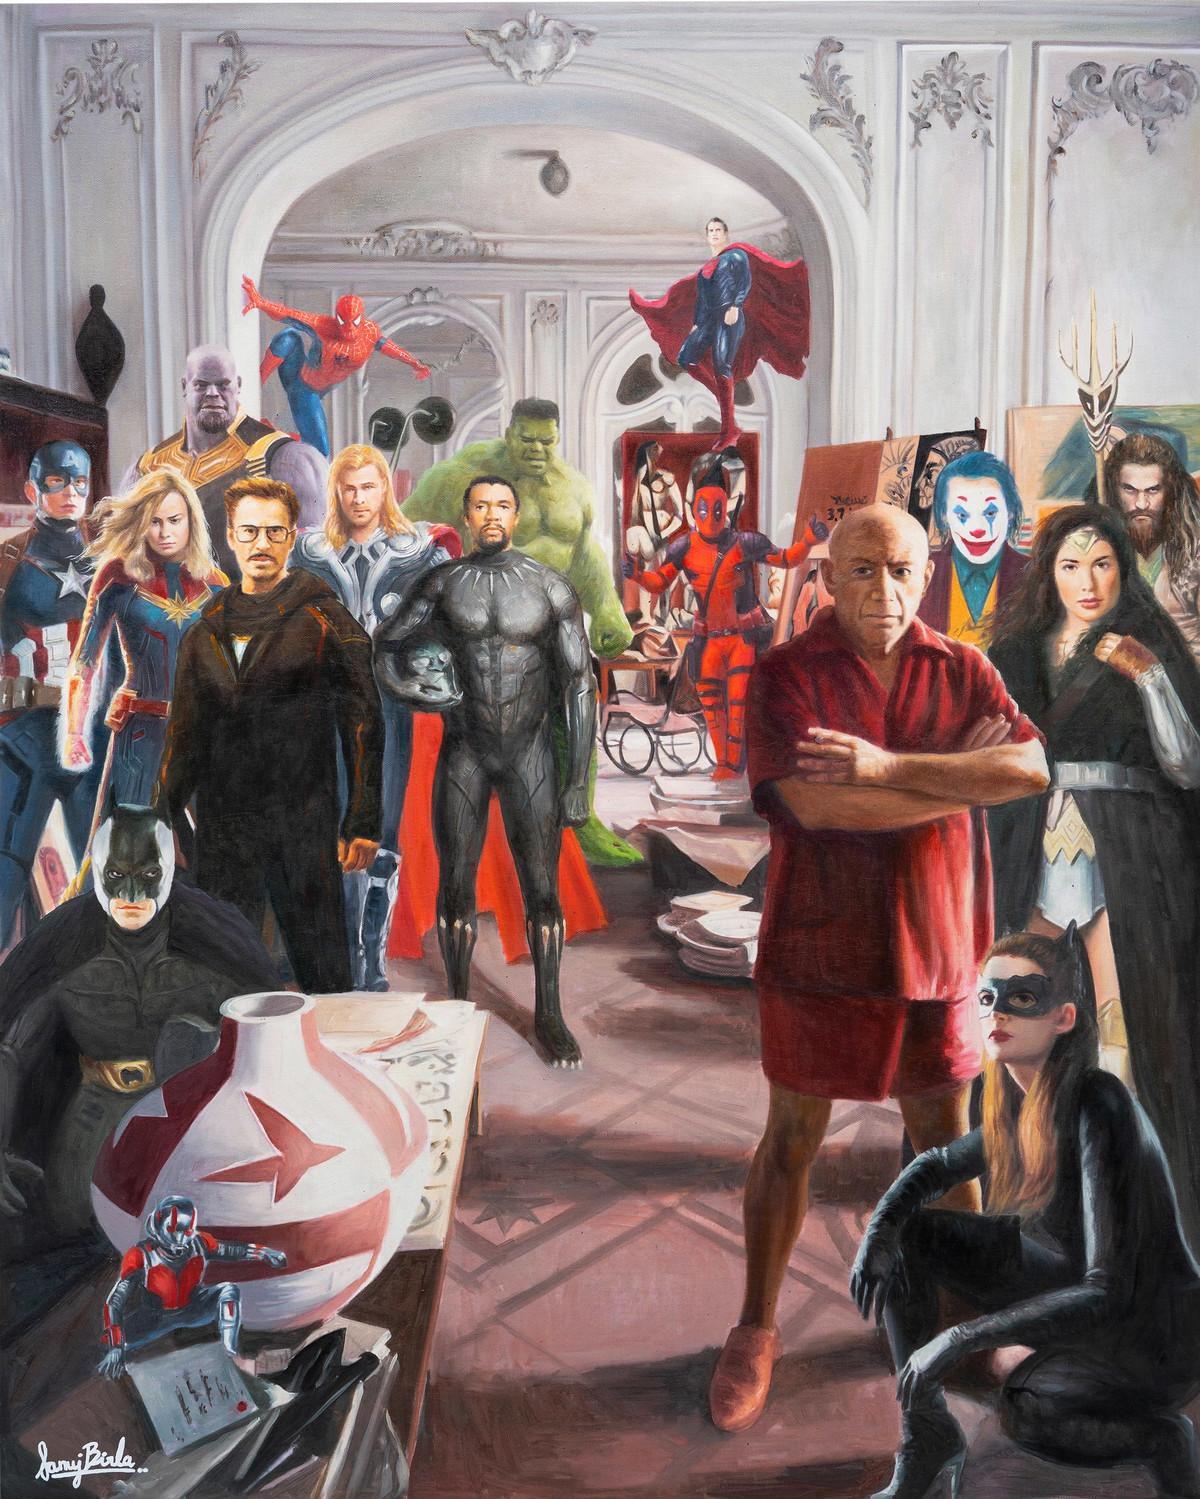 Superheros visit picasso by Sanuj Birla, Pop Art Painting, Oil on Canvas, Brown color